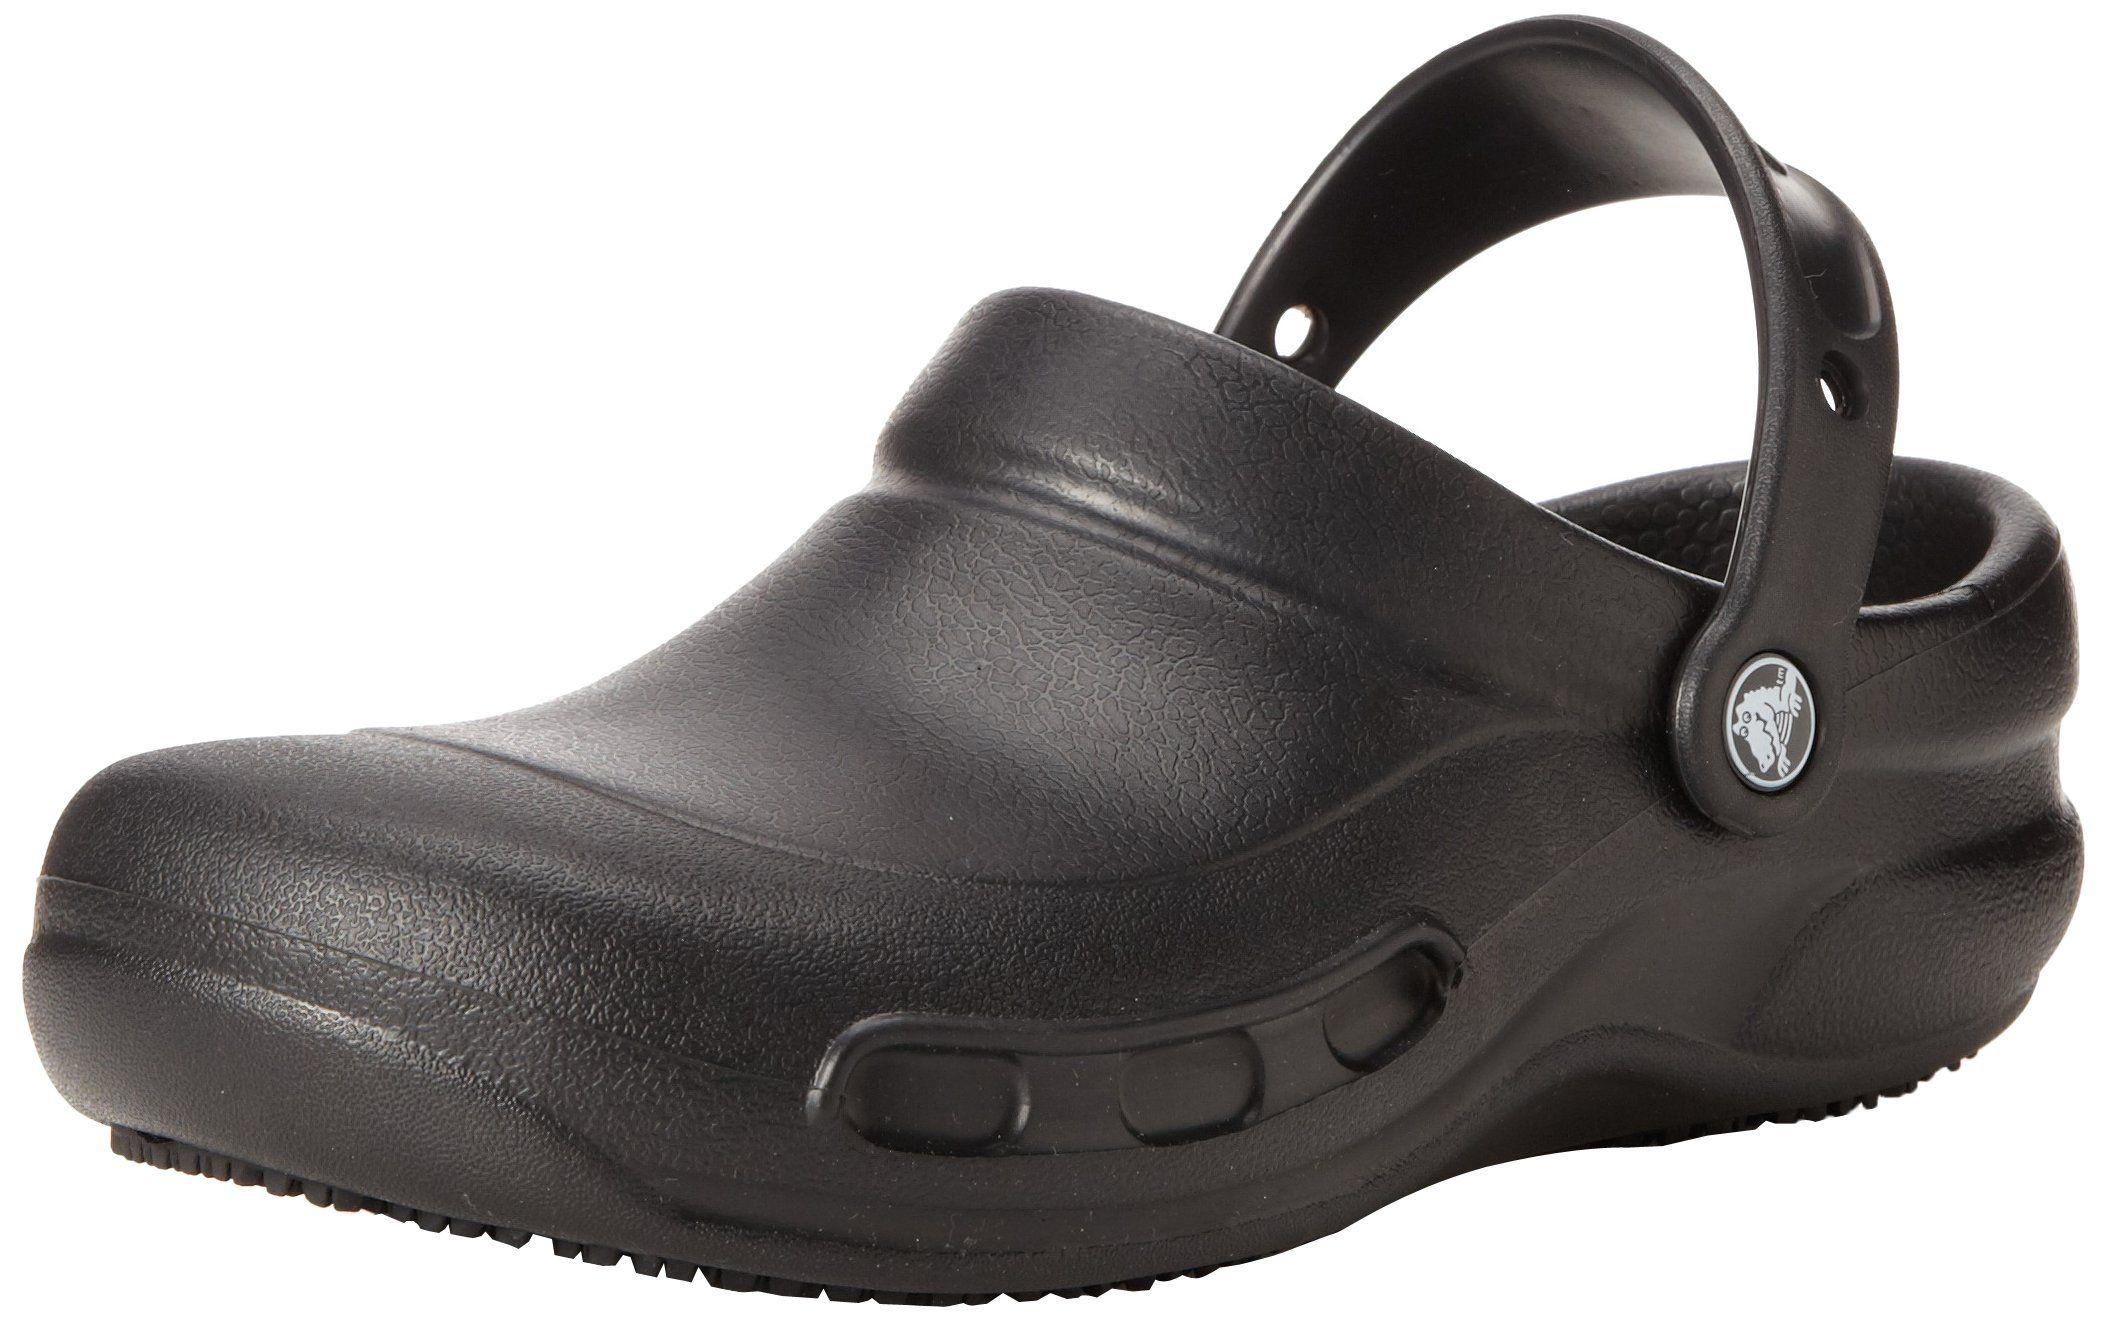 Crocs Mens Crocs Bistro Slip On Breathable Croslite Work Clog pBGJQ